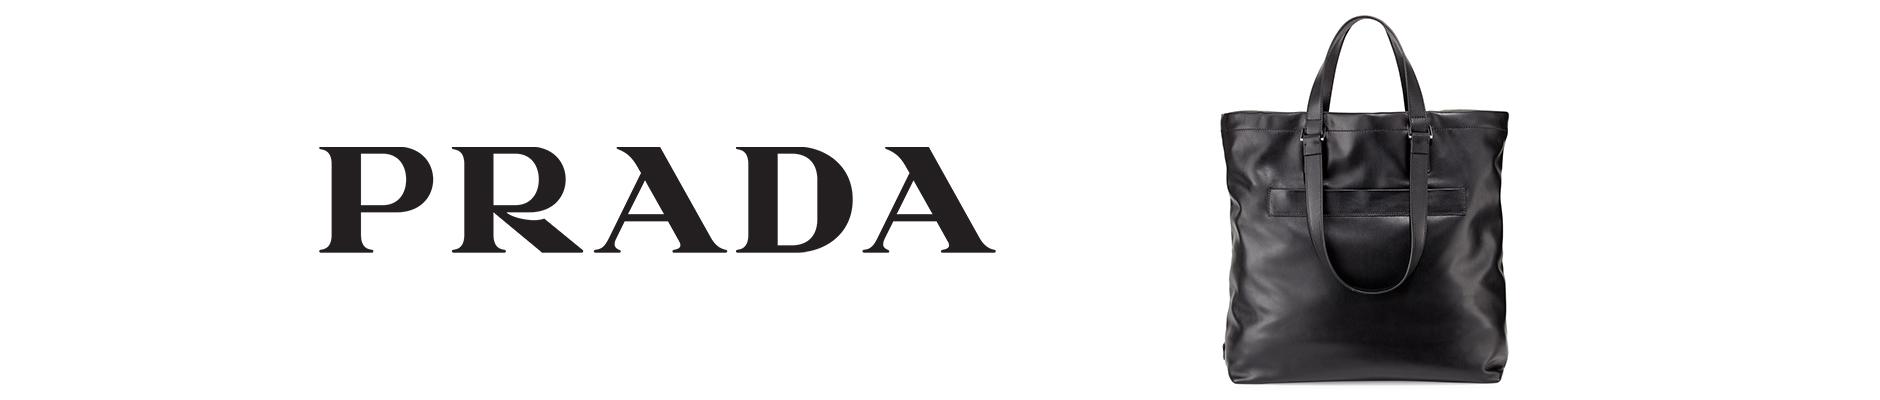 prada shoes history wikispaces logo sin